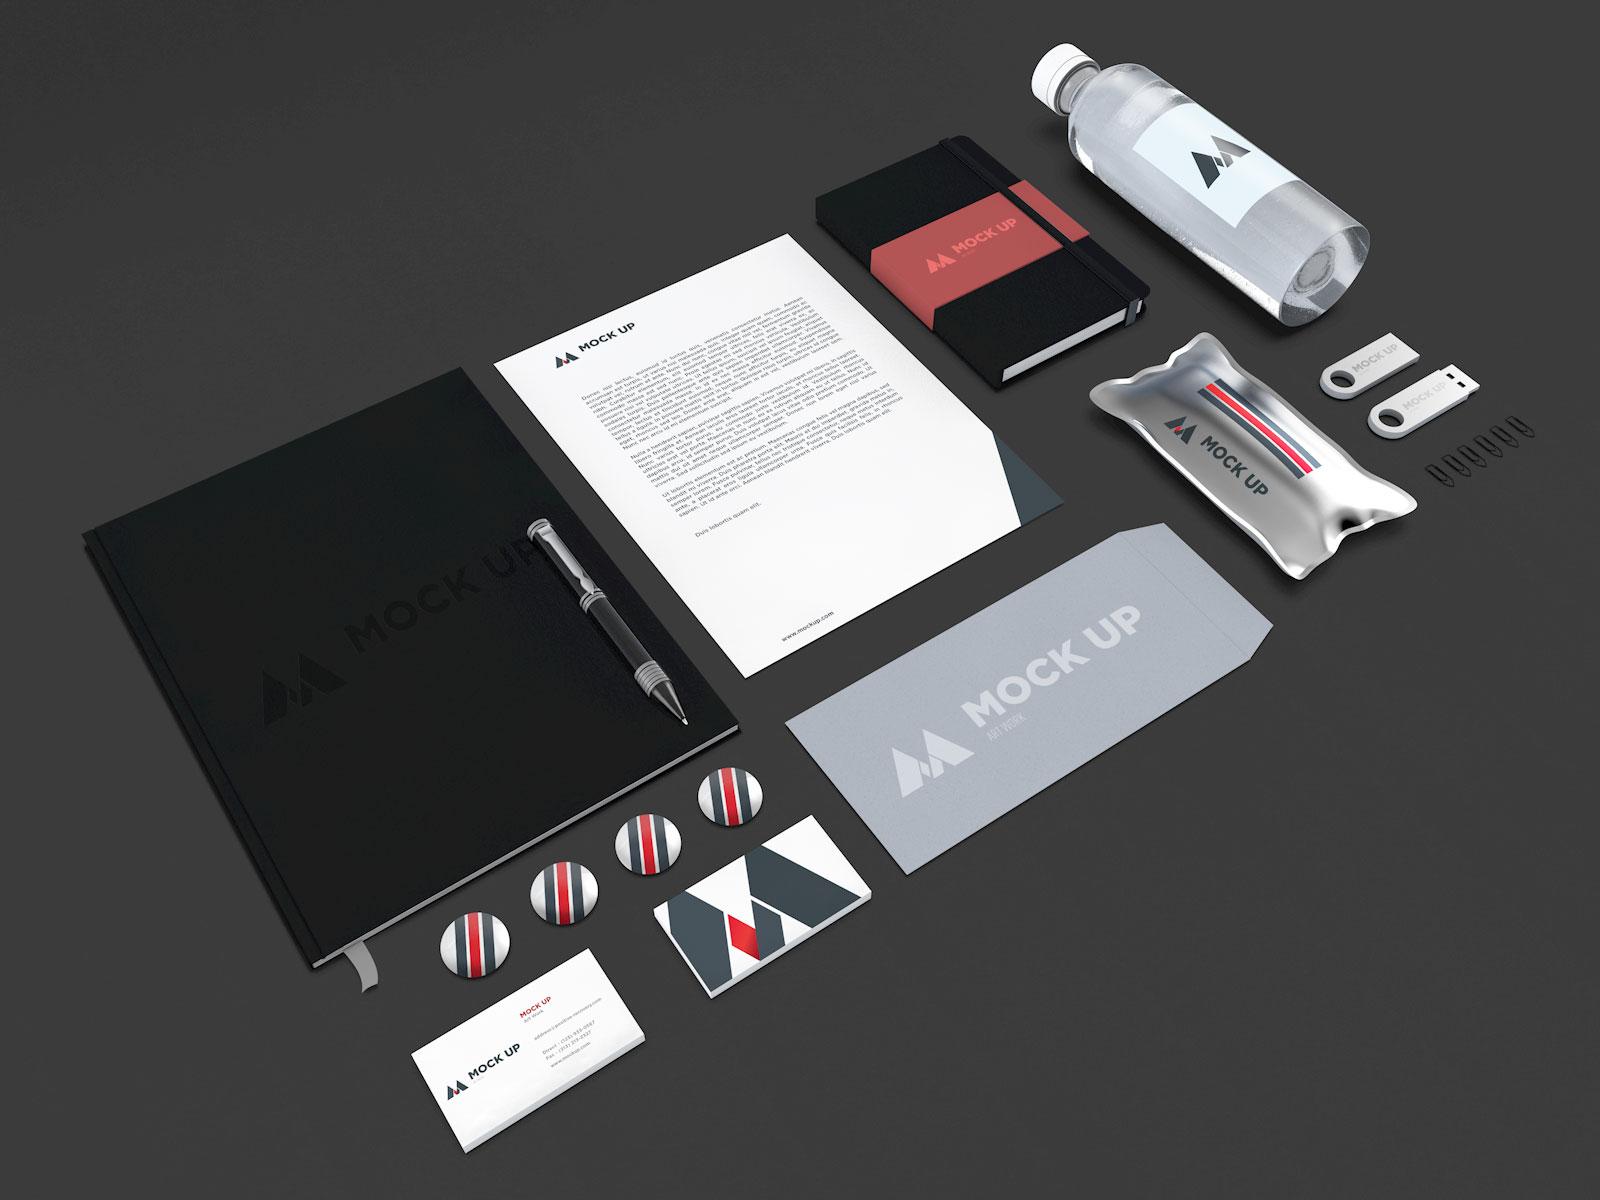 Free-Branding-Identity-Mockup-PSD-File